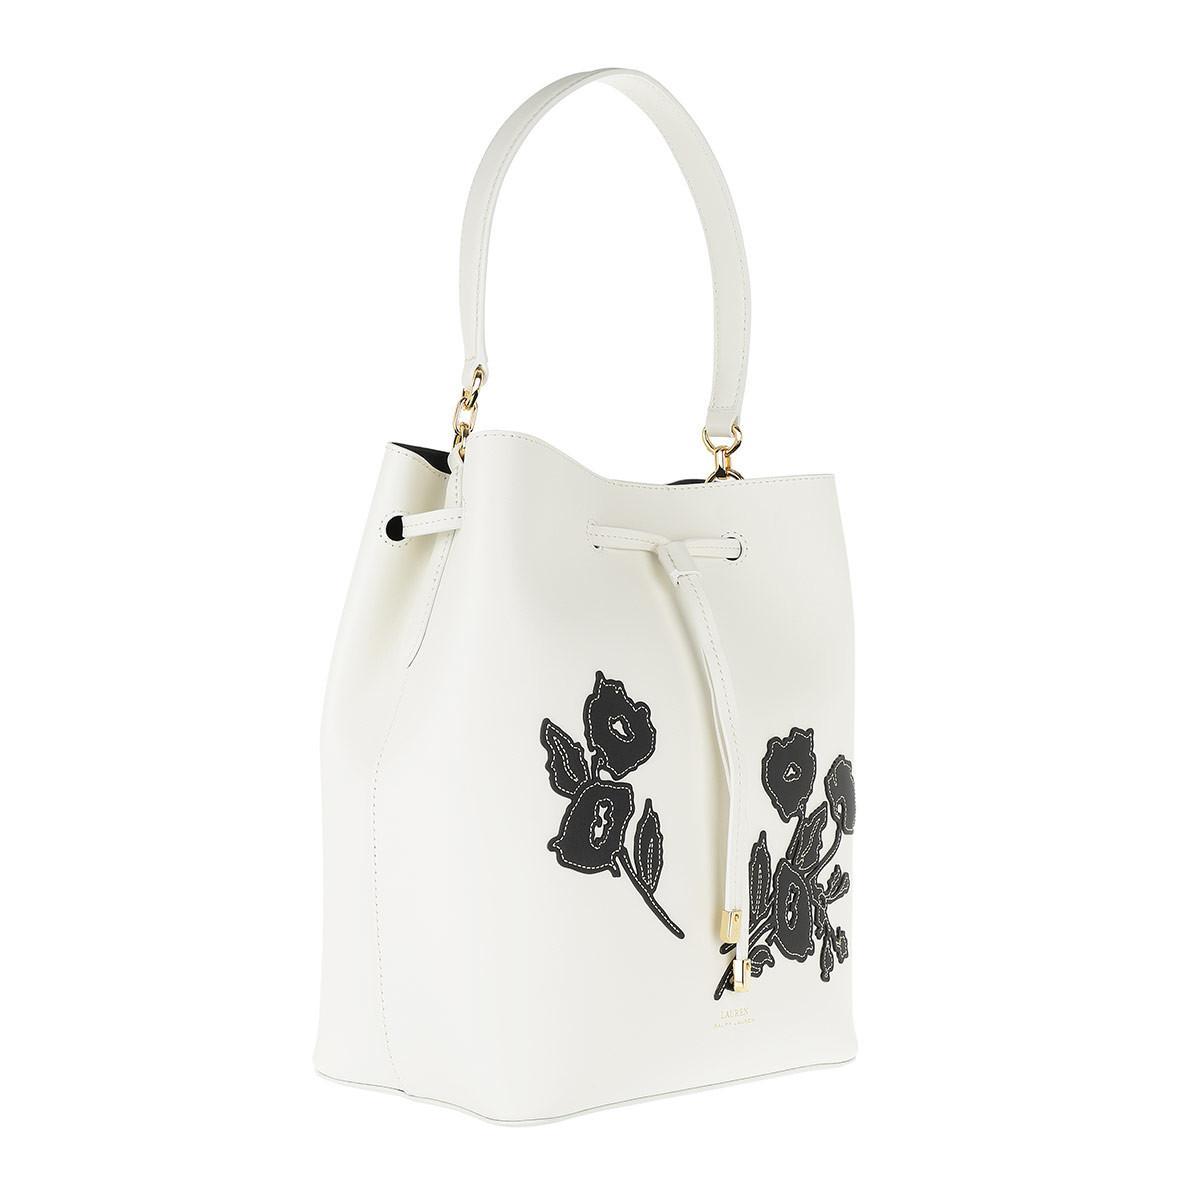 d90b89d123 Lauren by Ralph Lauren Dryden Drawstring Bag Vanilla black Floral in ...